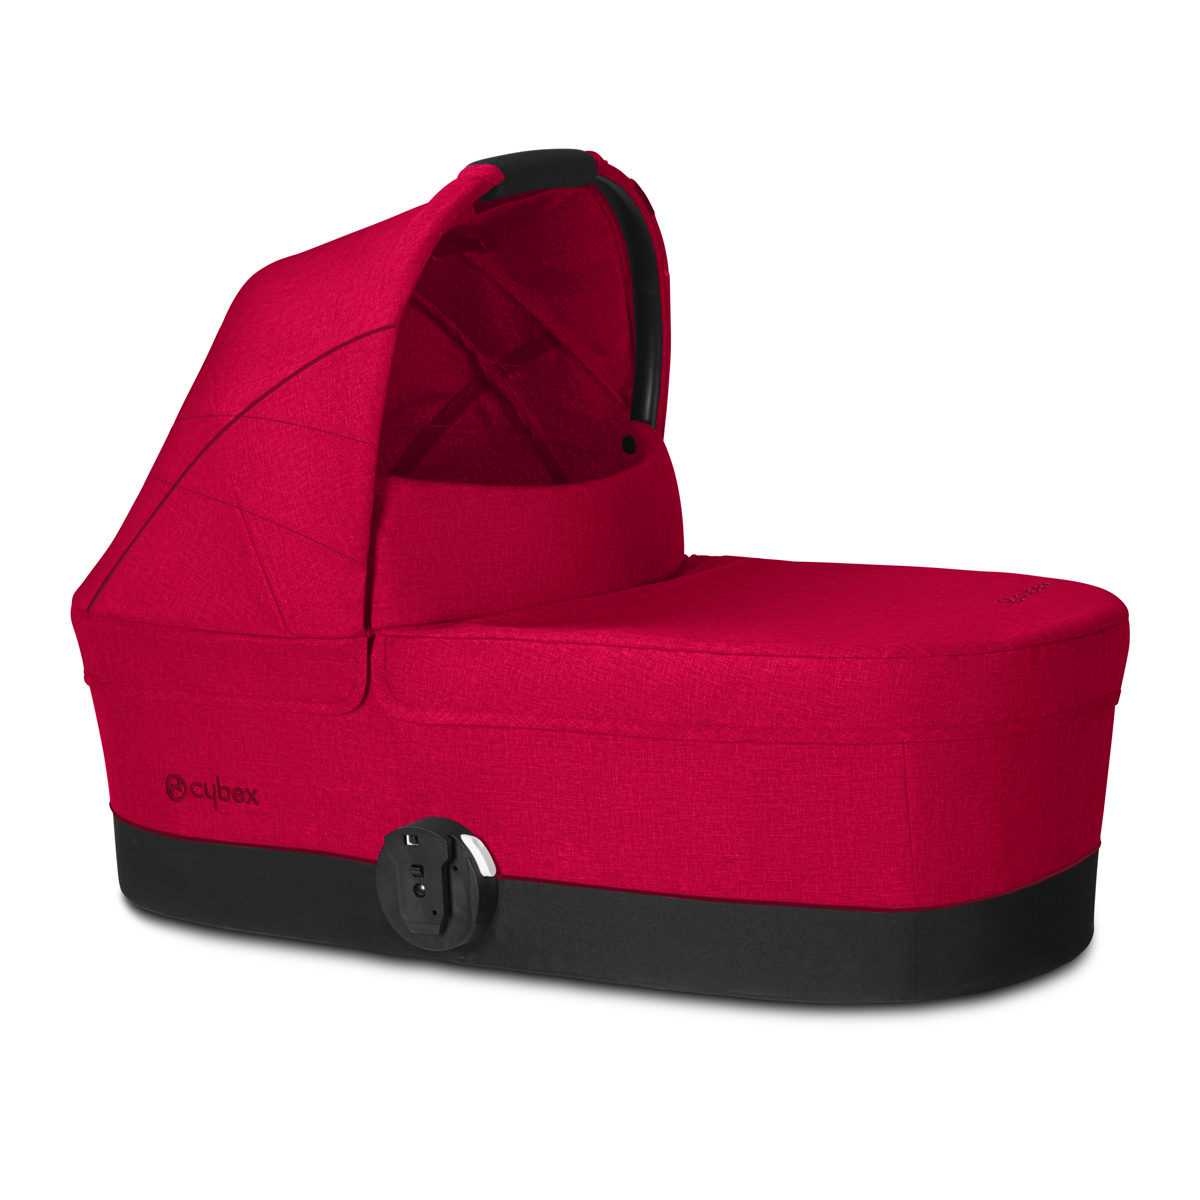 Nacelle Nacelle S - Rebel Red Nacelle S - Rebel Red